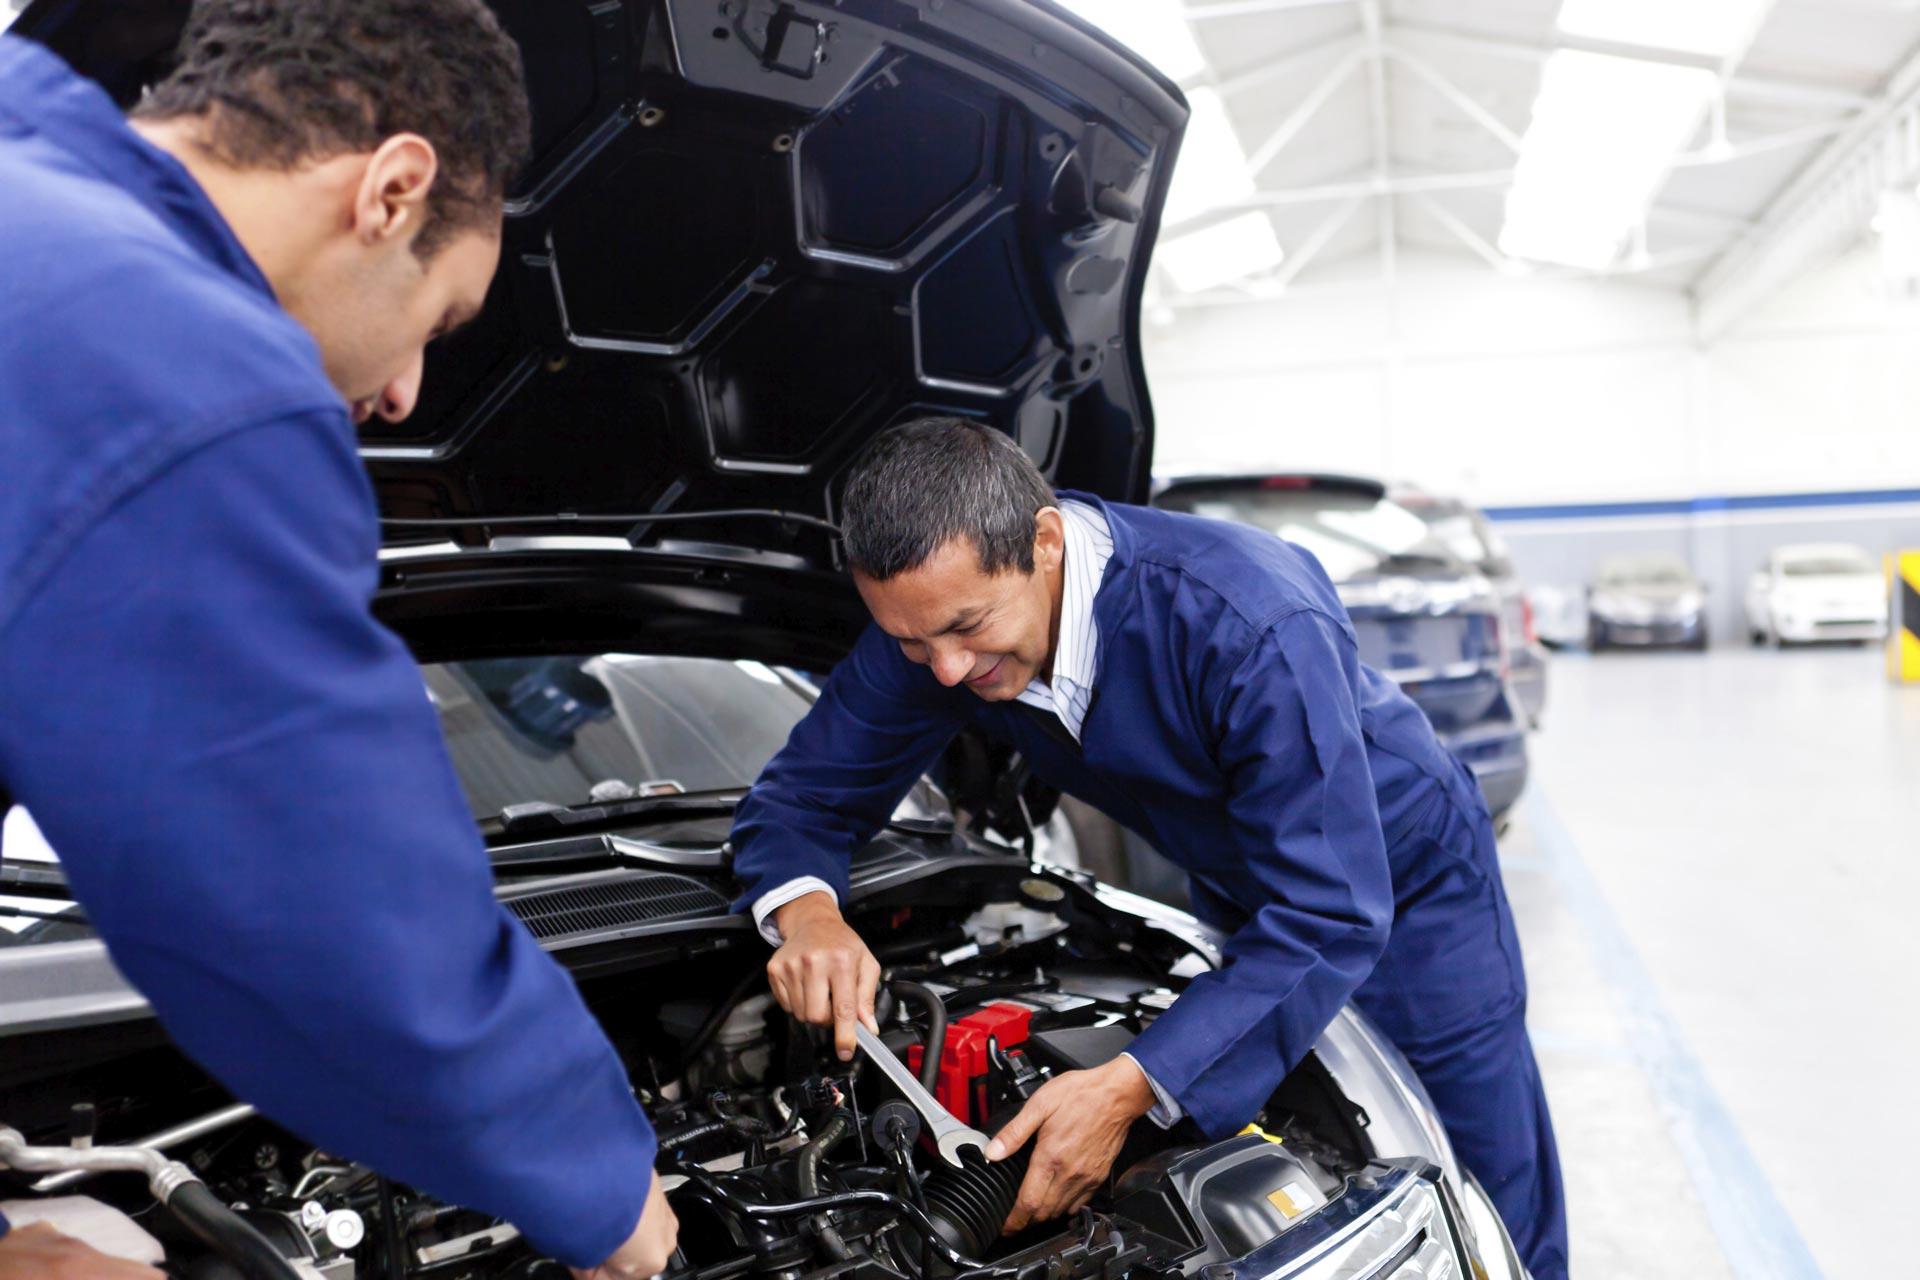 Japanese Auto Service in San Rafael, CA - Easy Automotive